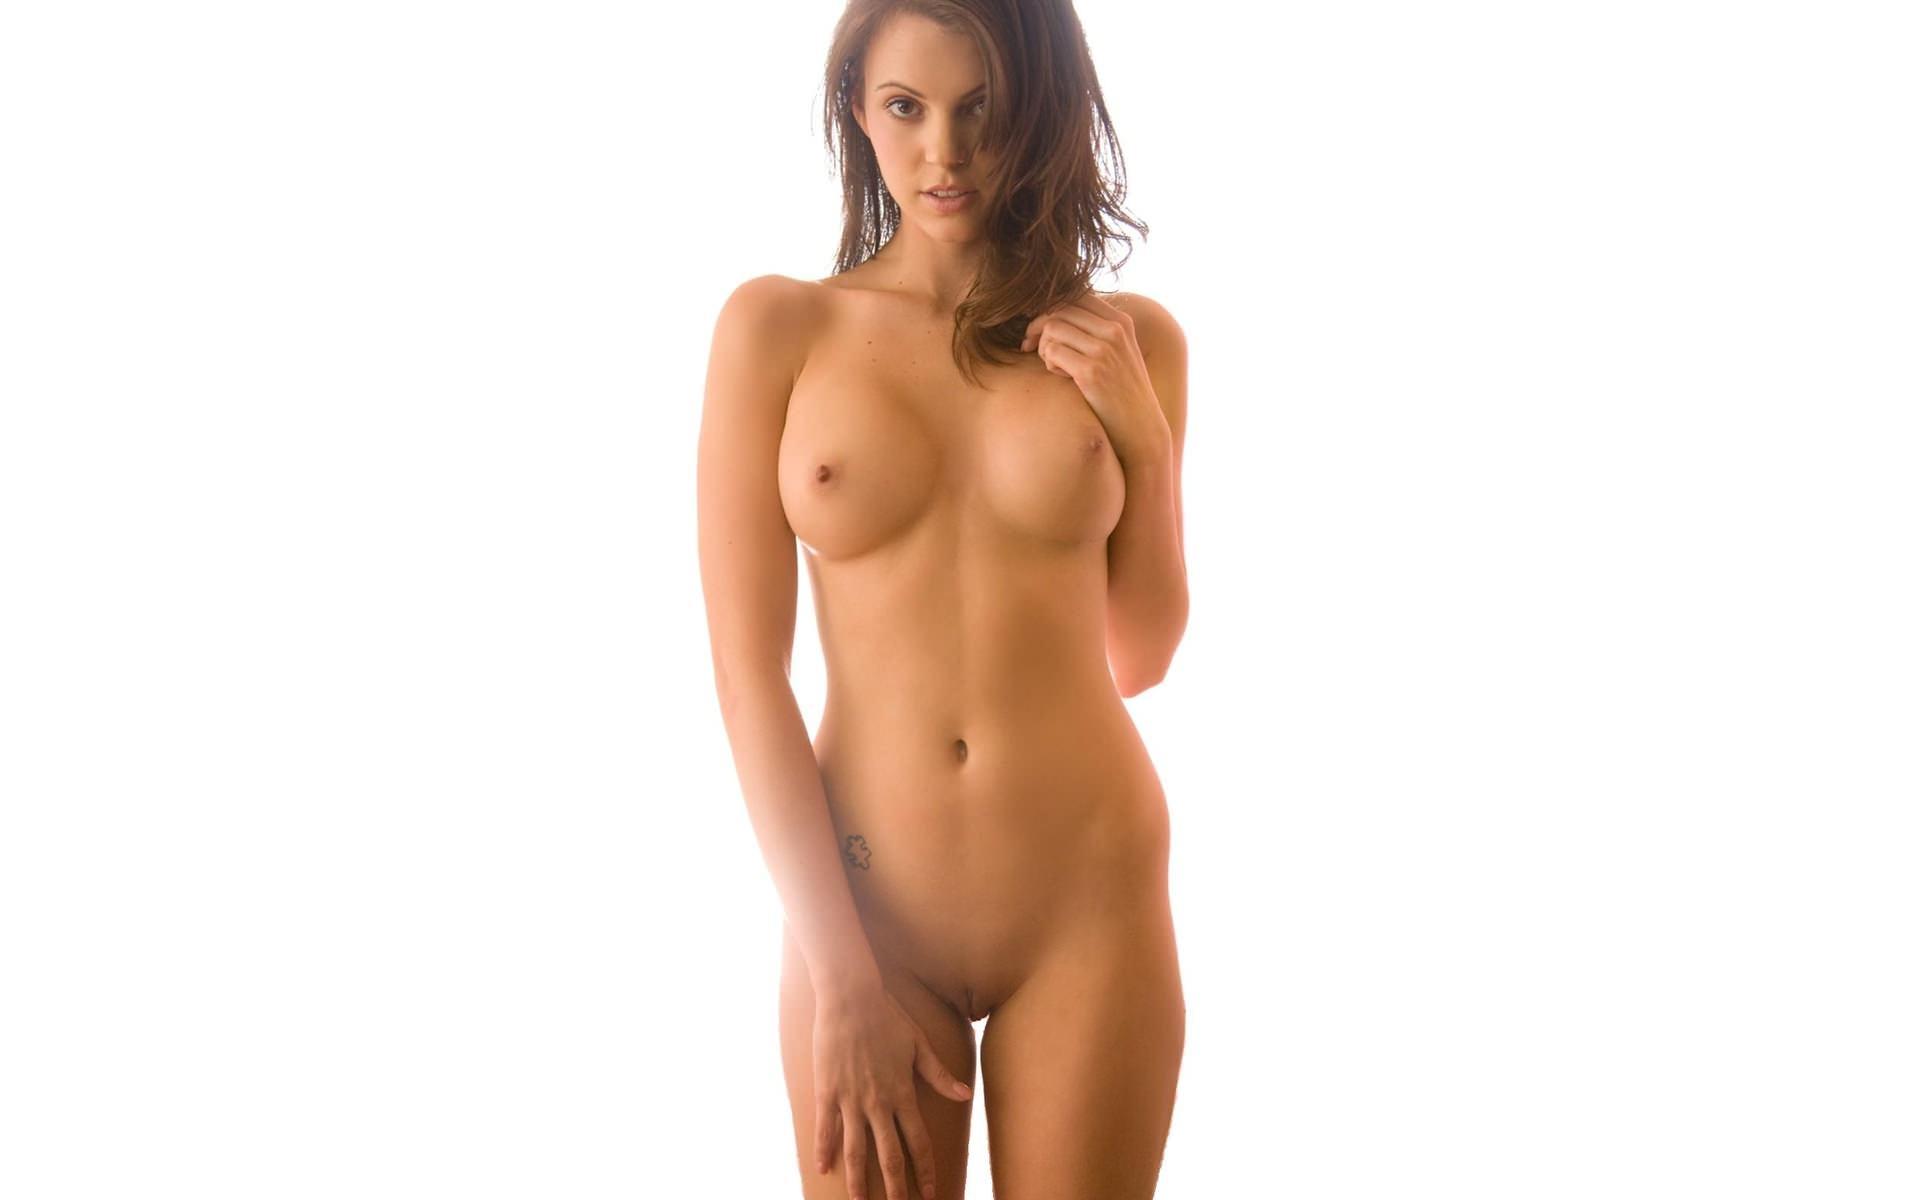 Nude Women Sensual